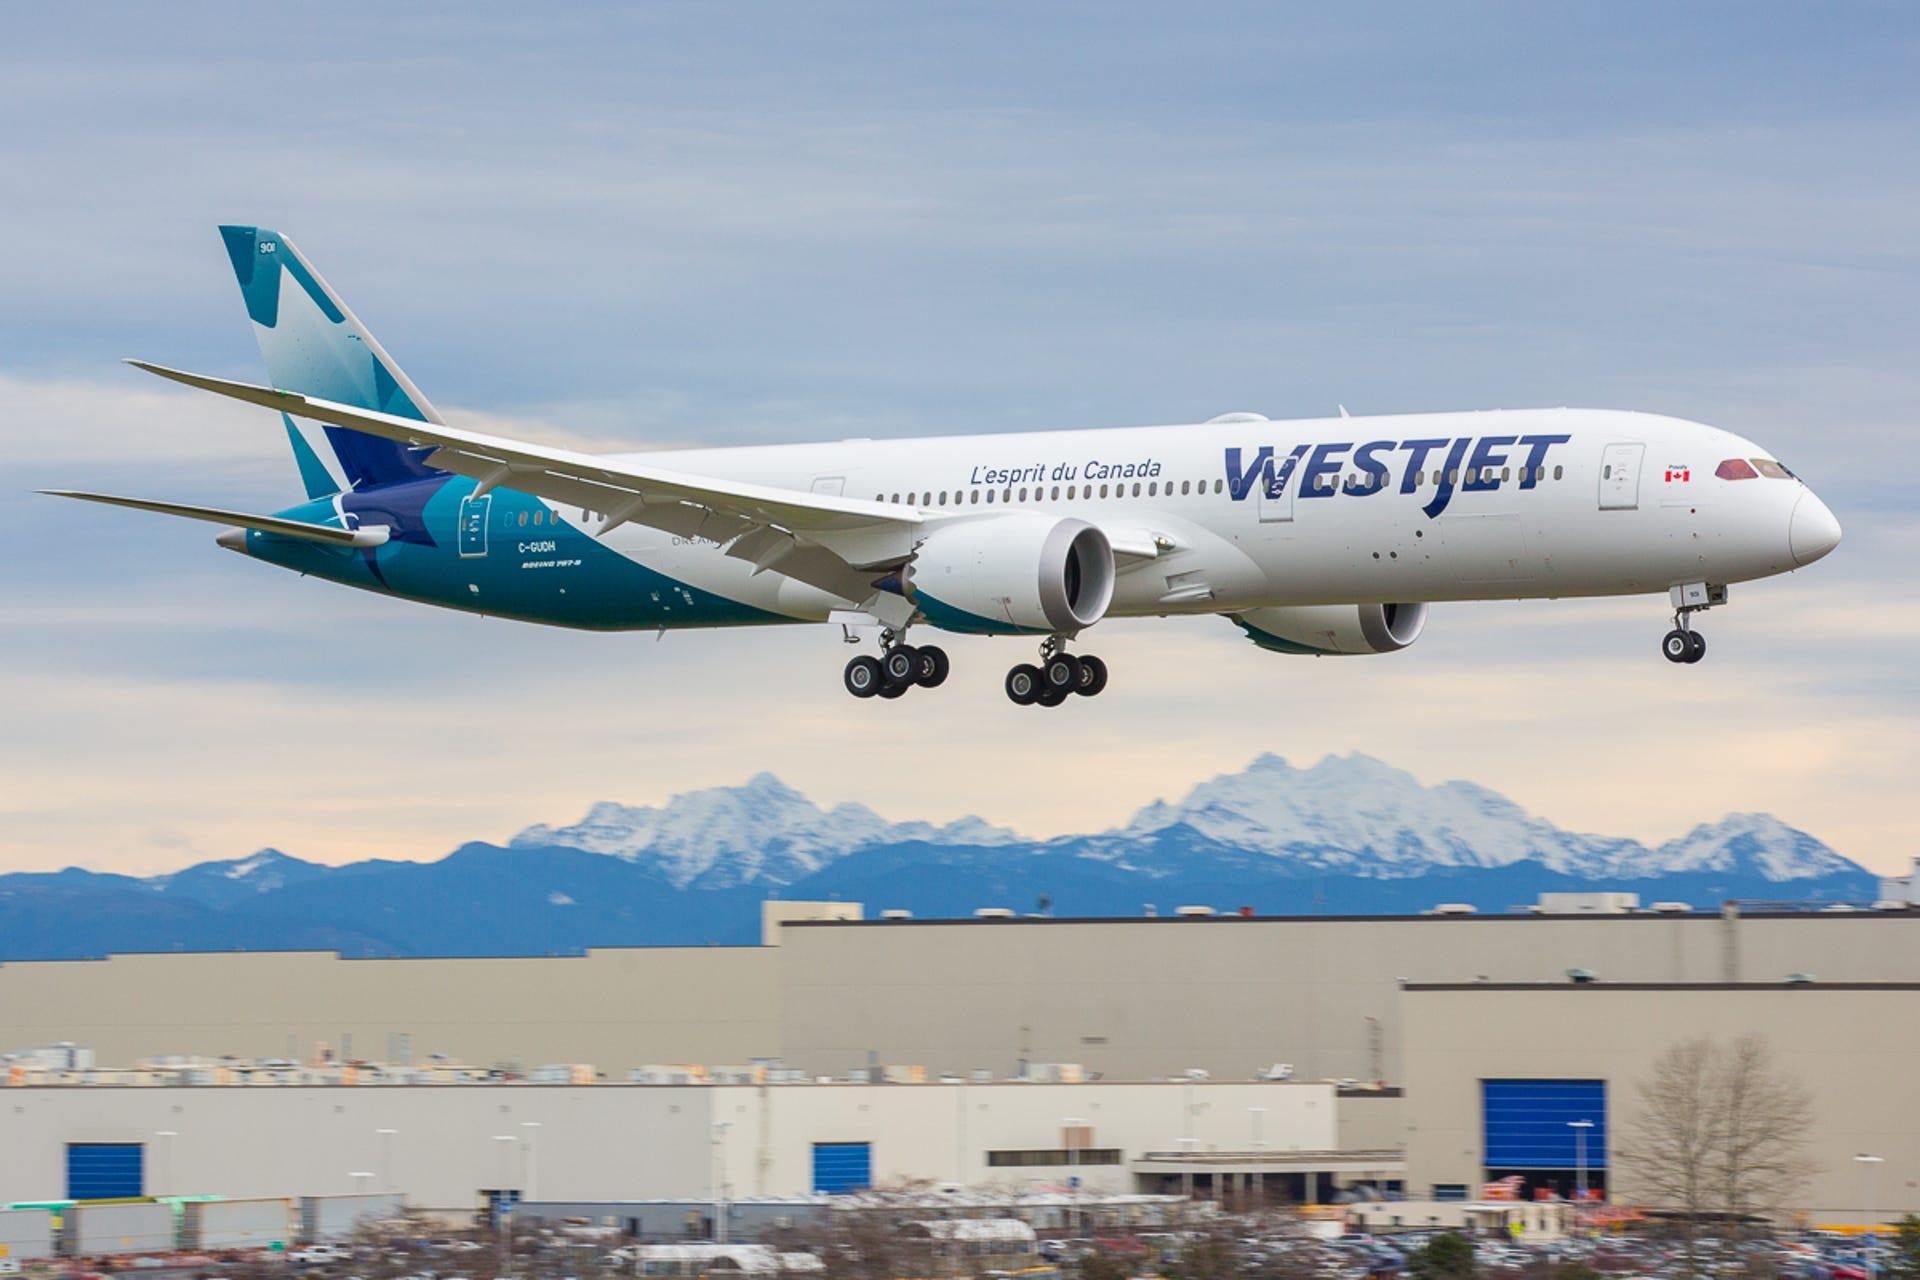 WestJet Airlines' first Boeing 787 Dreamliner takes flight